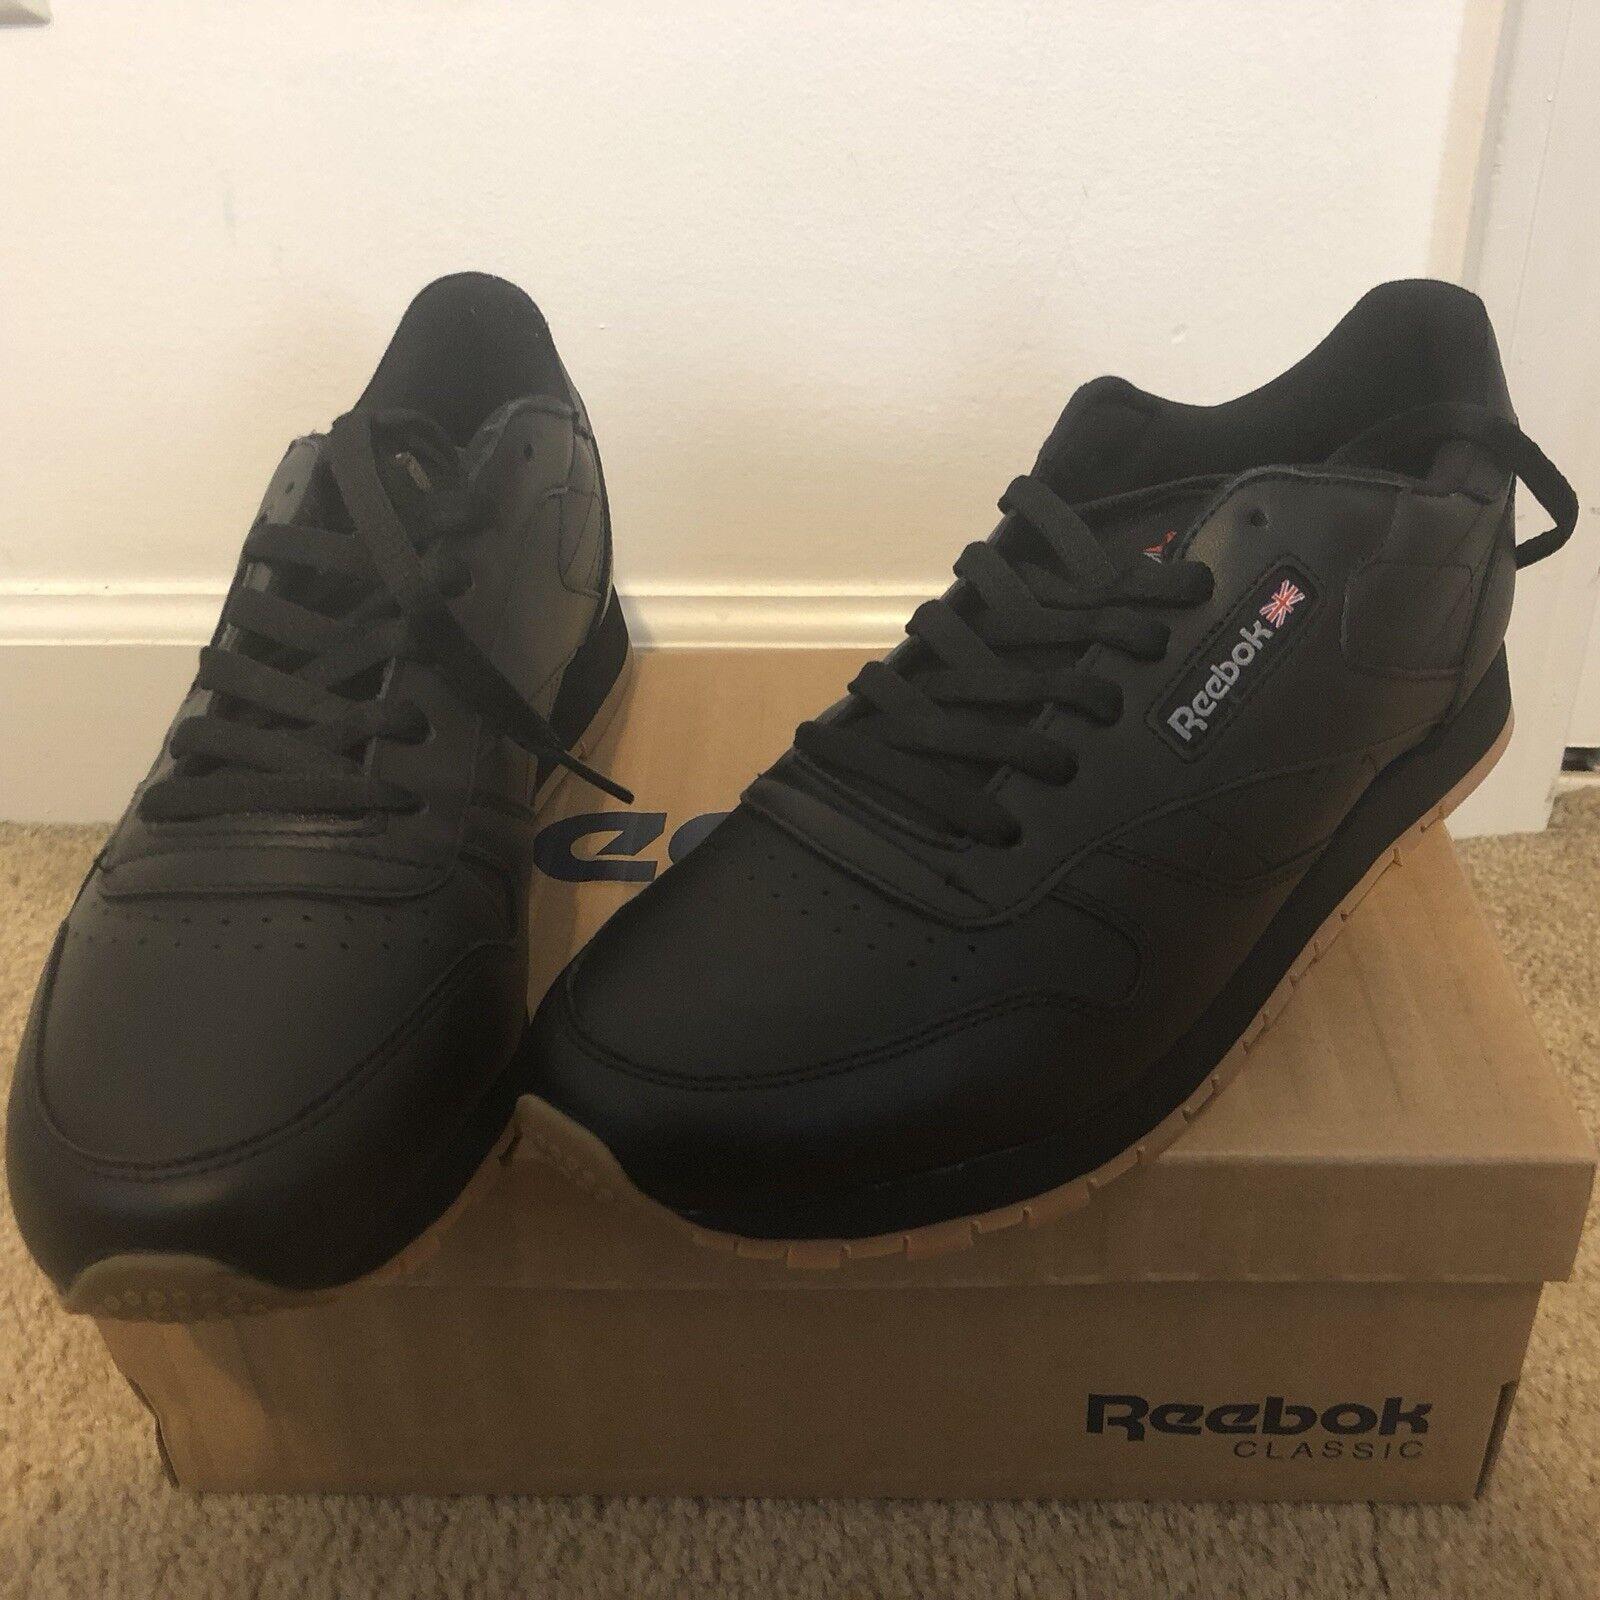 Reebok classic shoes women. Leather.